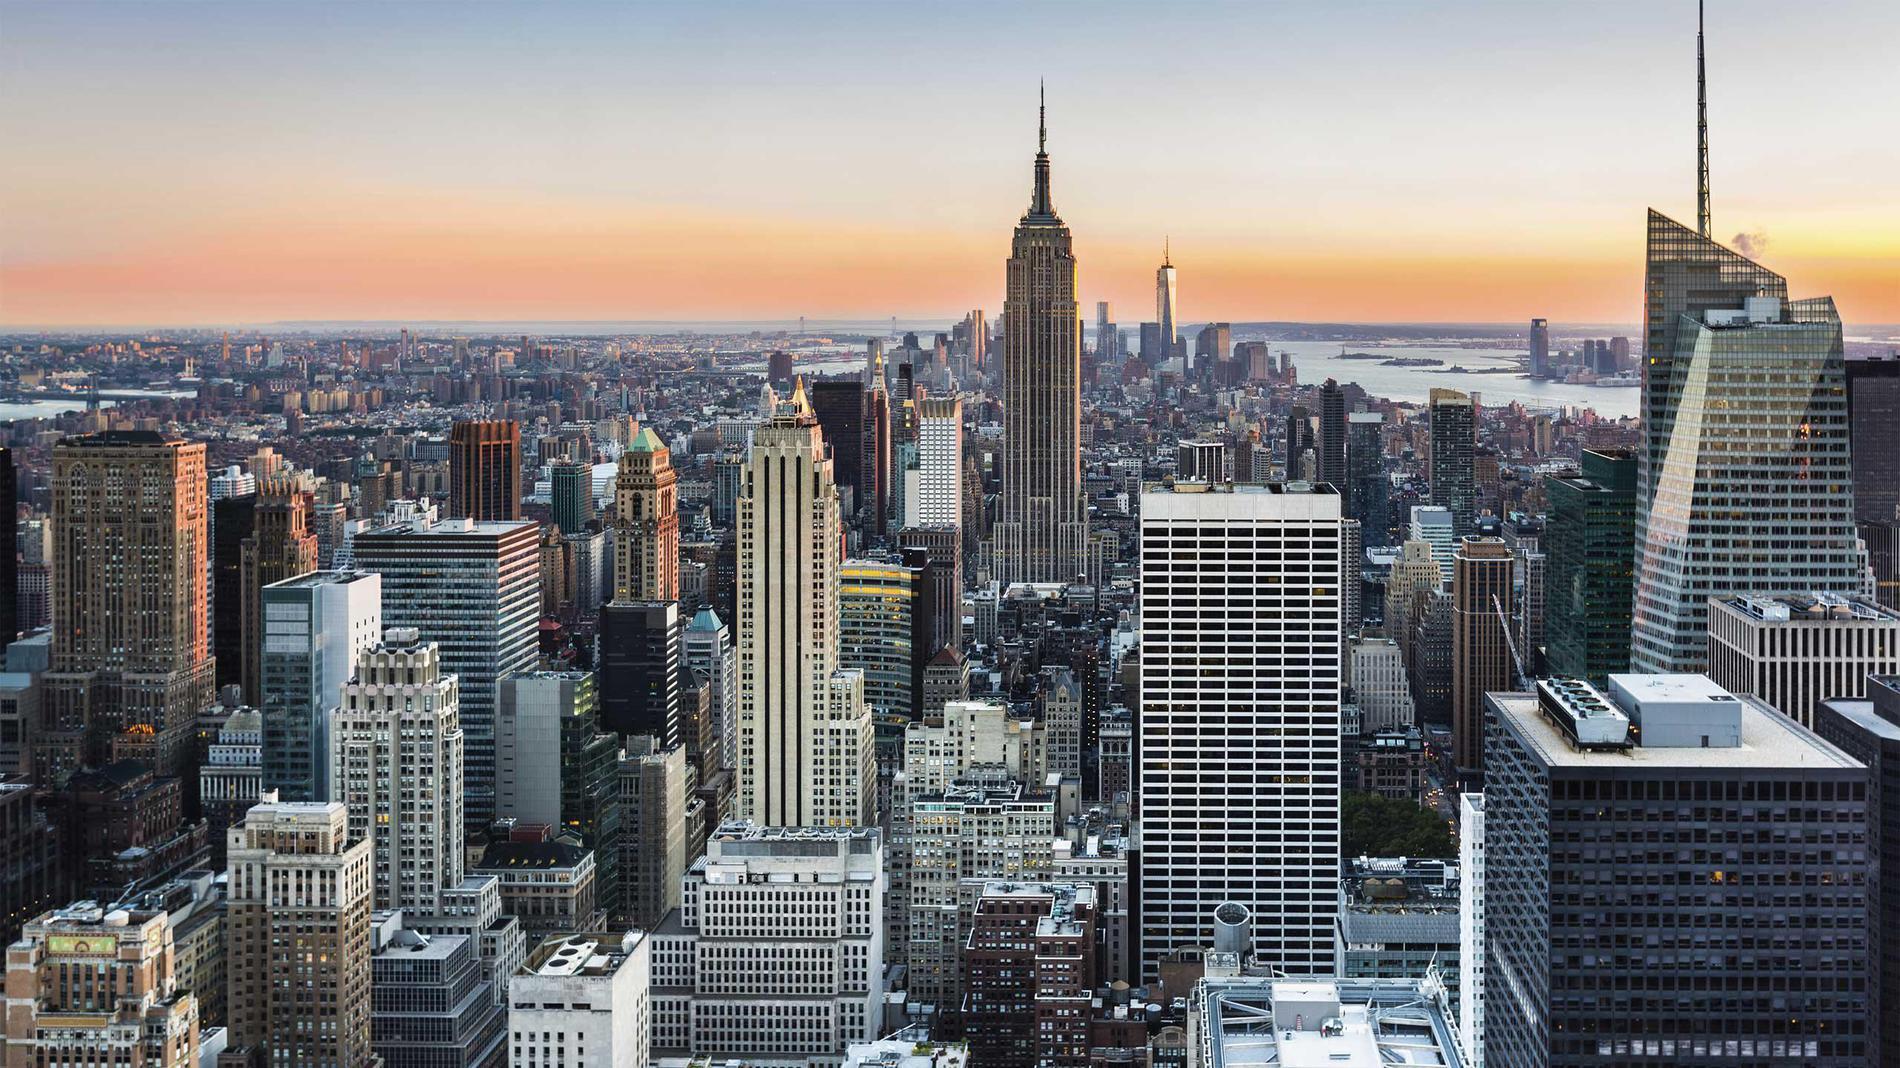 Morgan Stanley Rockefeller Center Branch | New York, NY